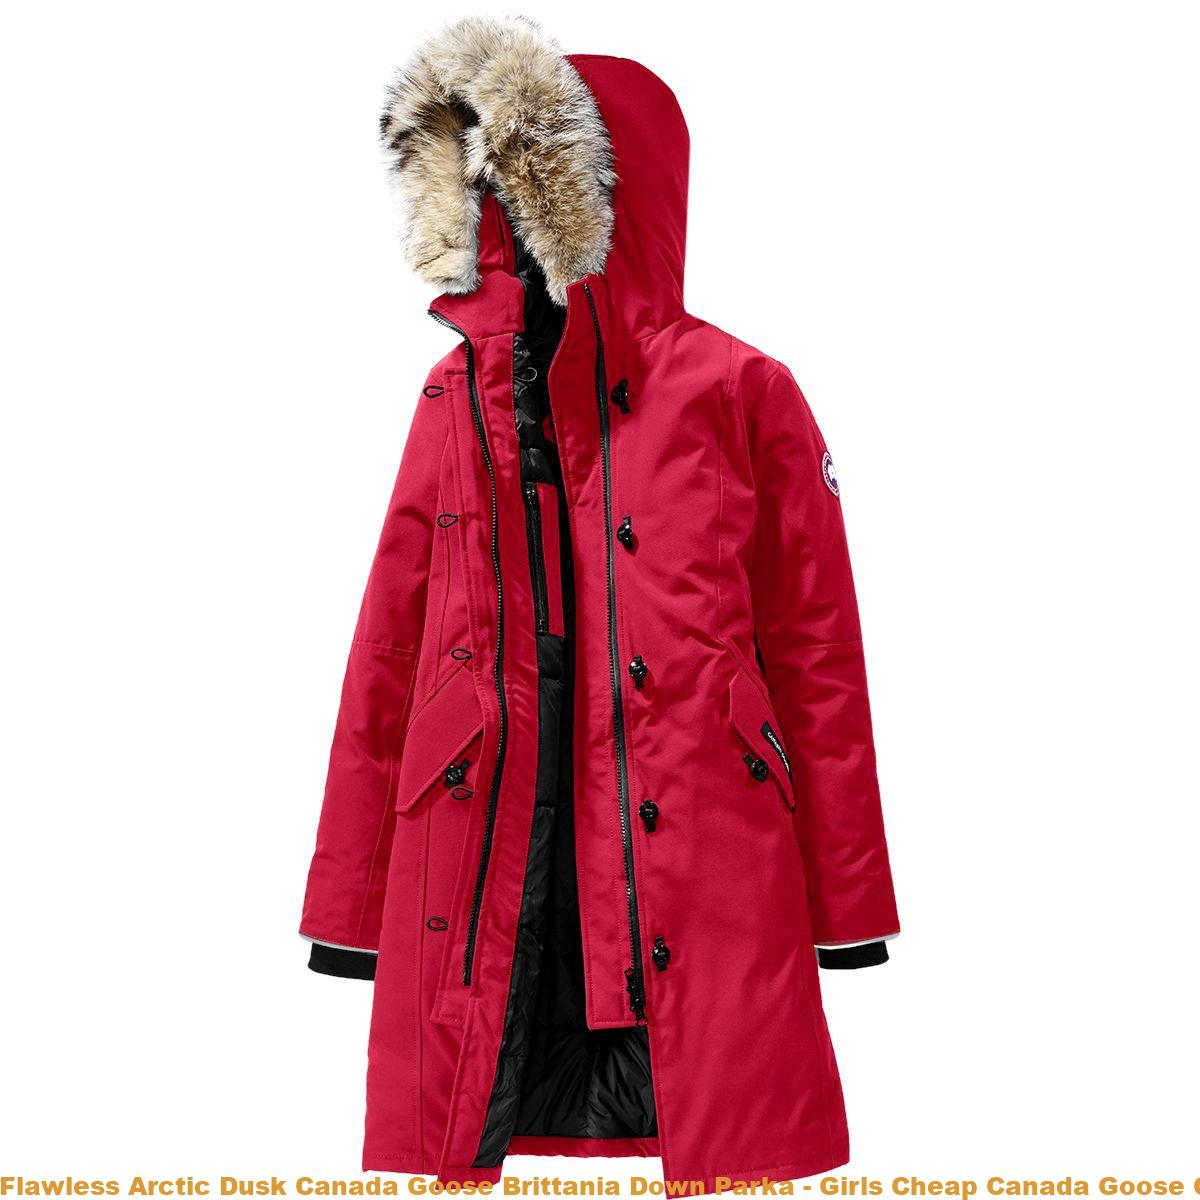 04adc4824 Flawless Arctic Dusk Canada Goose Brittania Down Parka - Girls Cheap Canada  Goose Coats Uk CDG3413